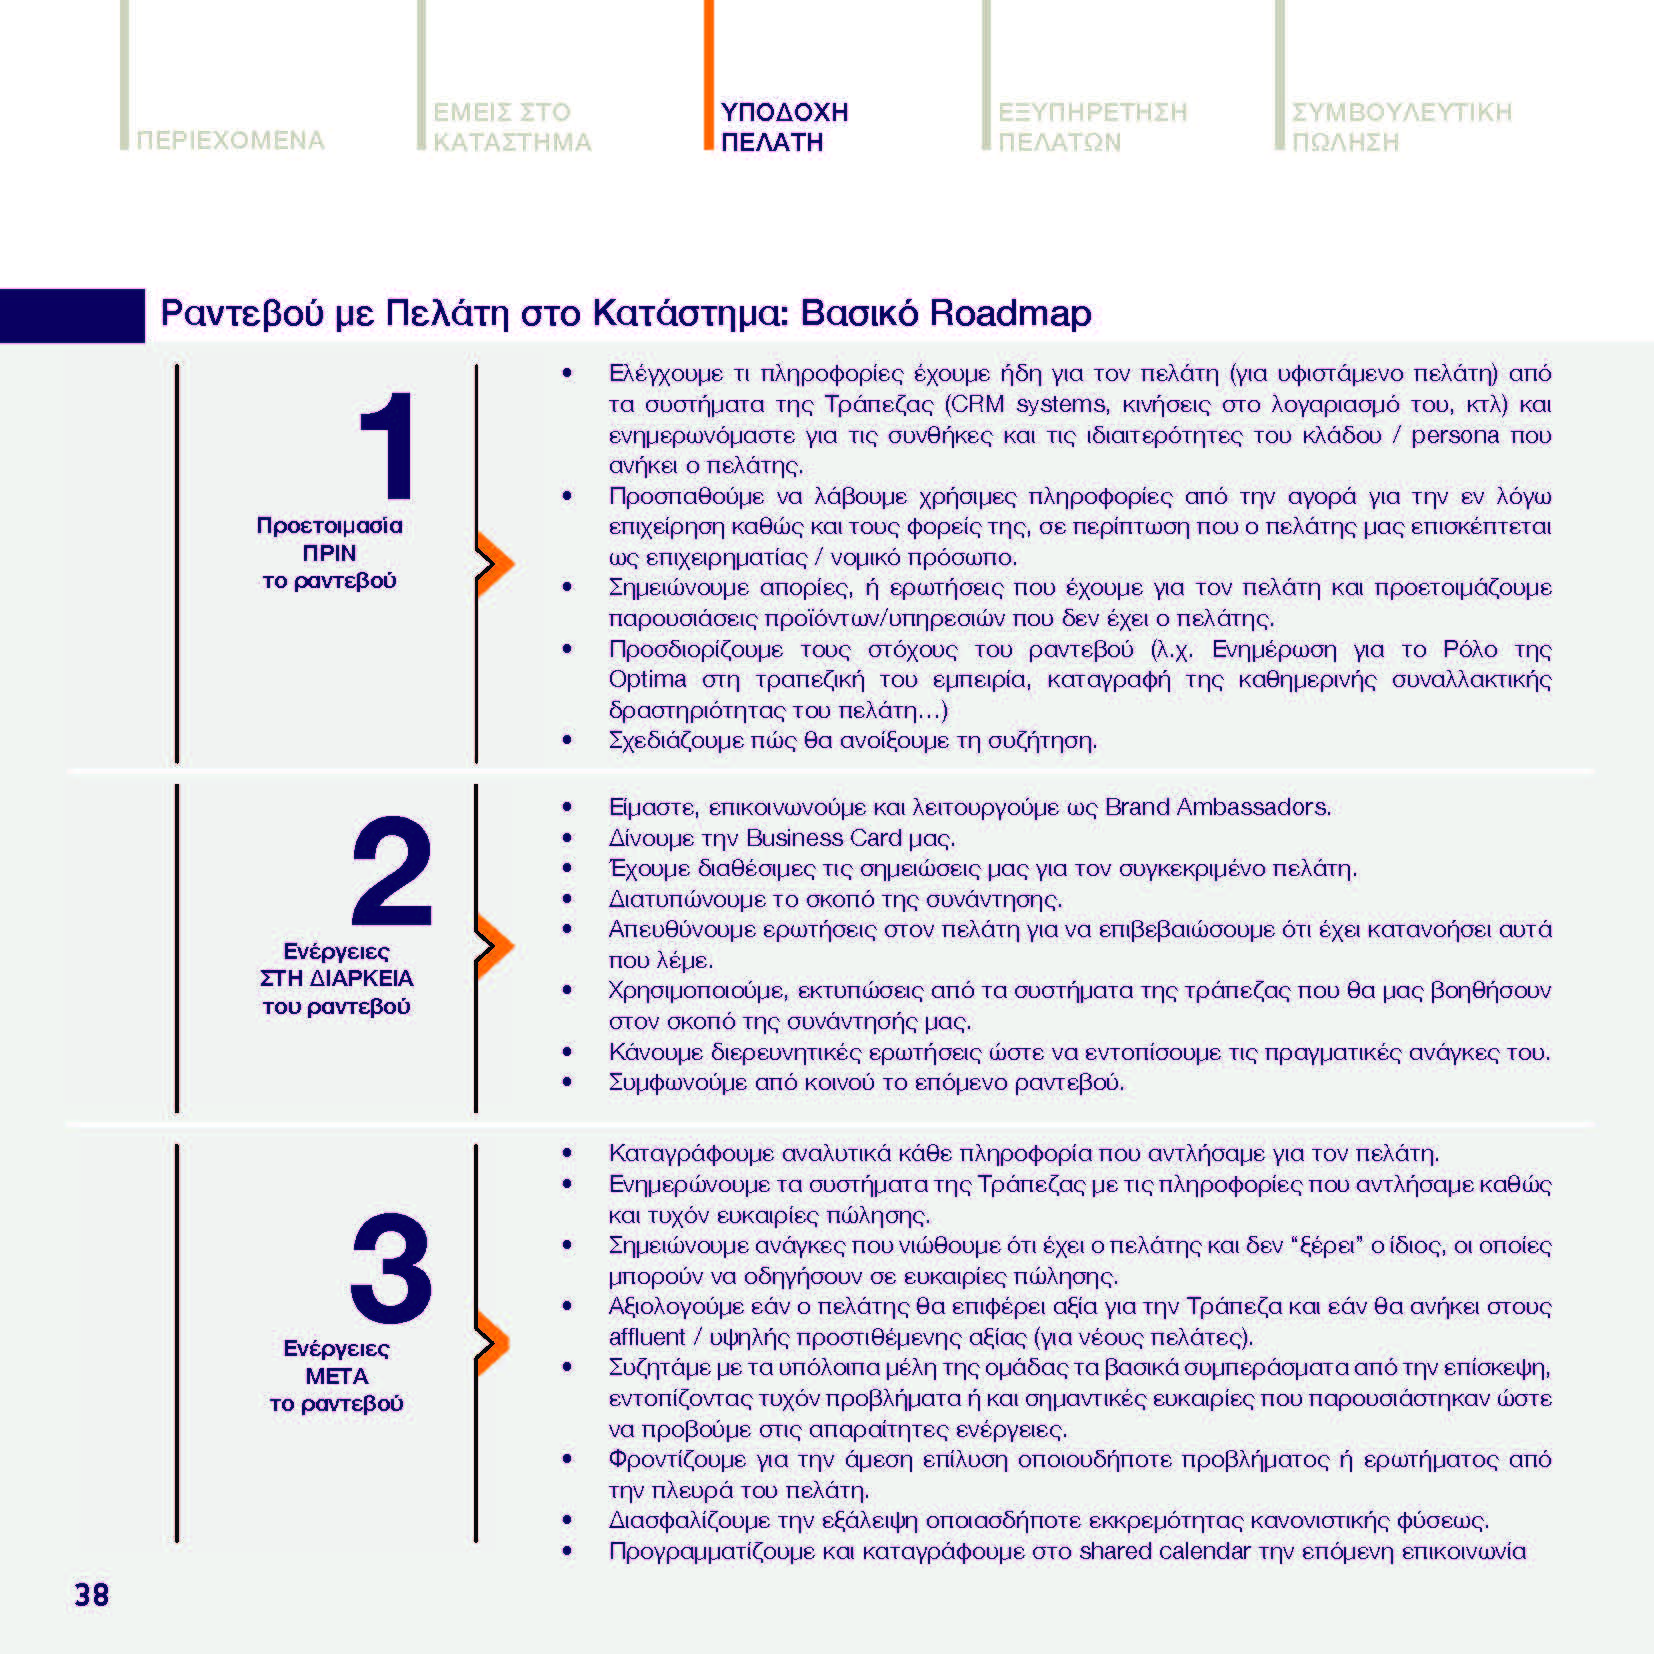 https://www.jib.gr/wp-content/uploads/2020/09/OPTIMA-BANK-BOOKLET-WEB_Page_038.jpg